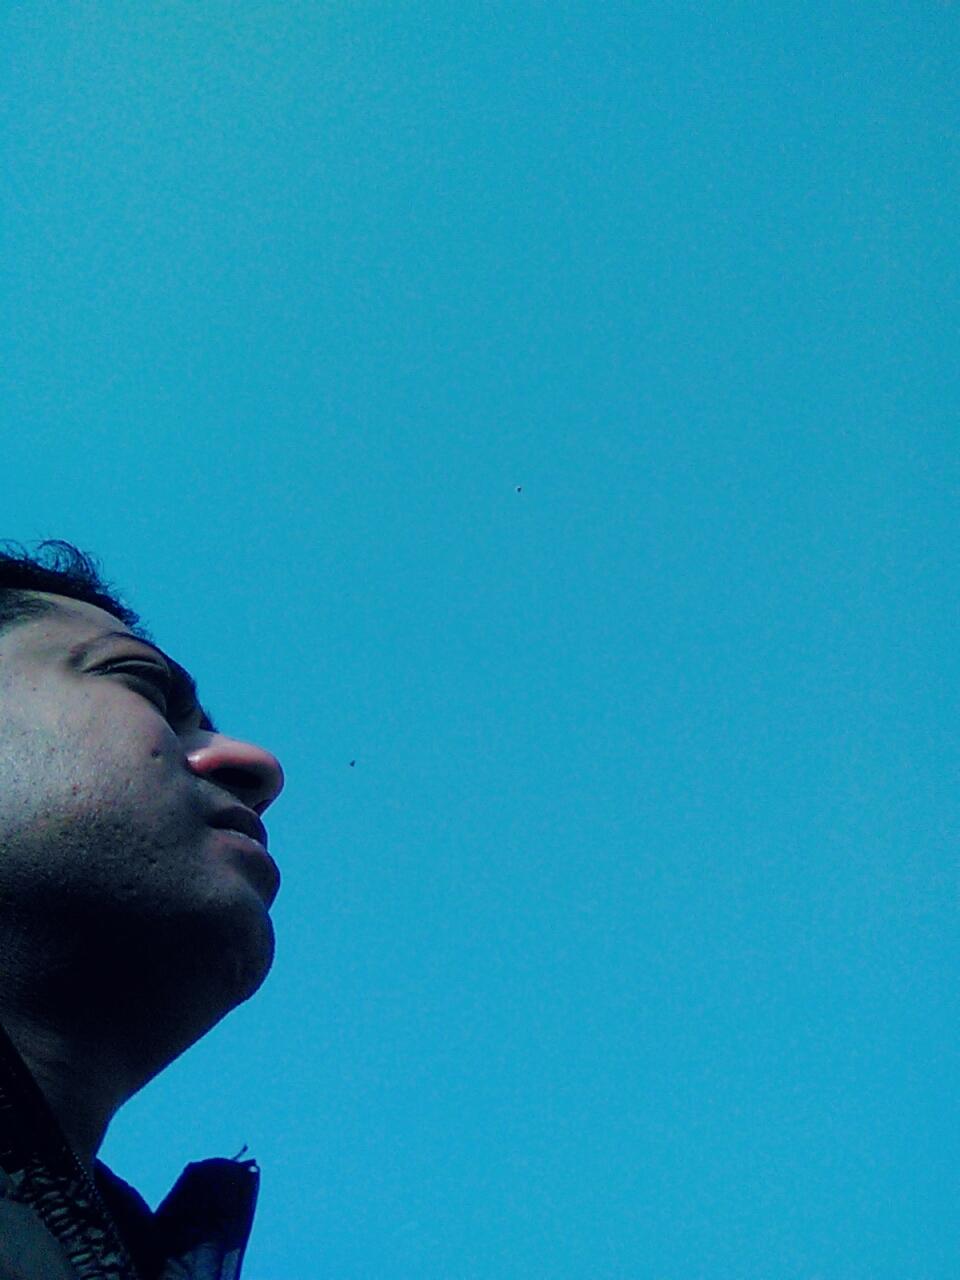 arnab paul (@arnabpaul4) Cover Image